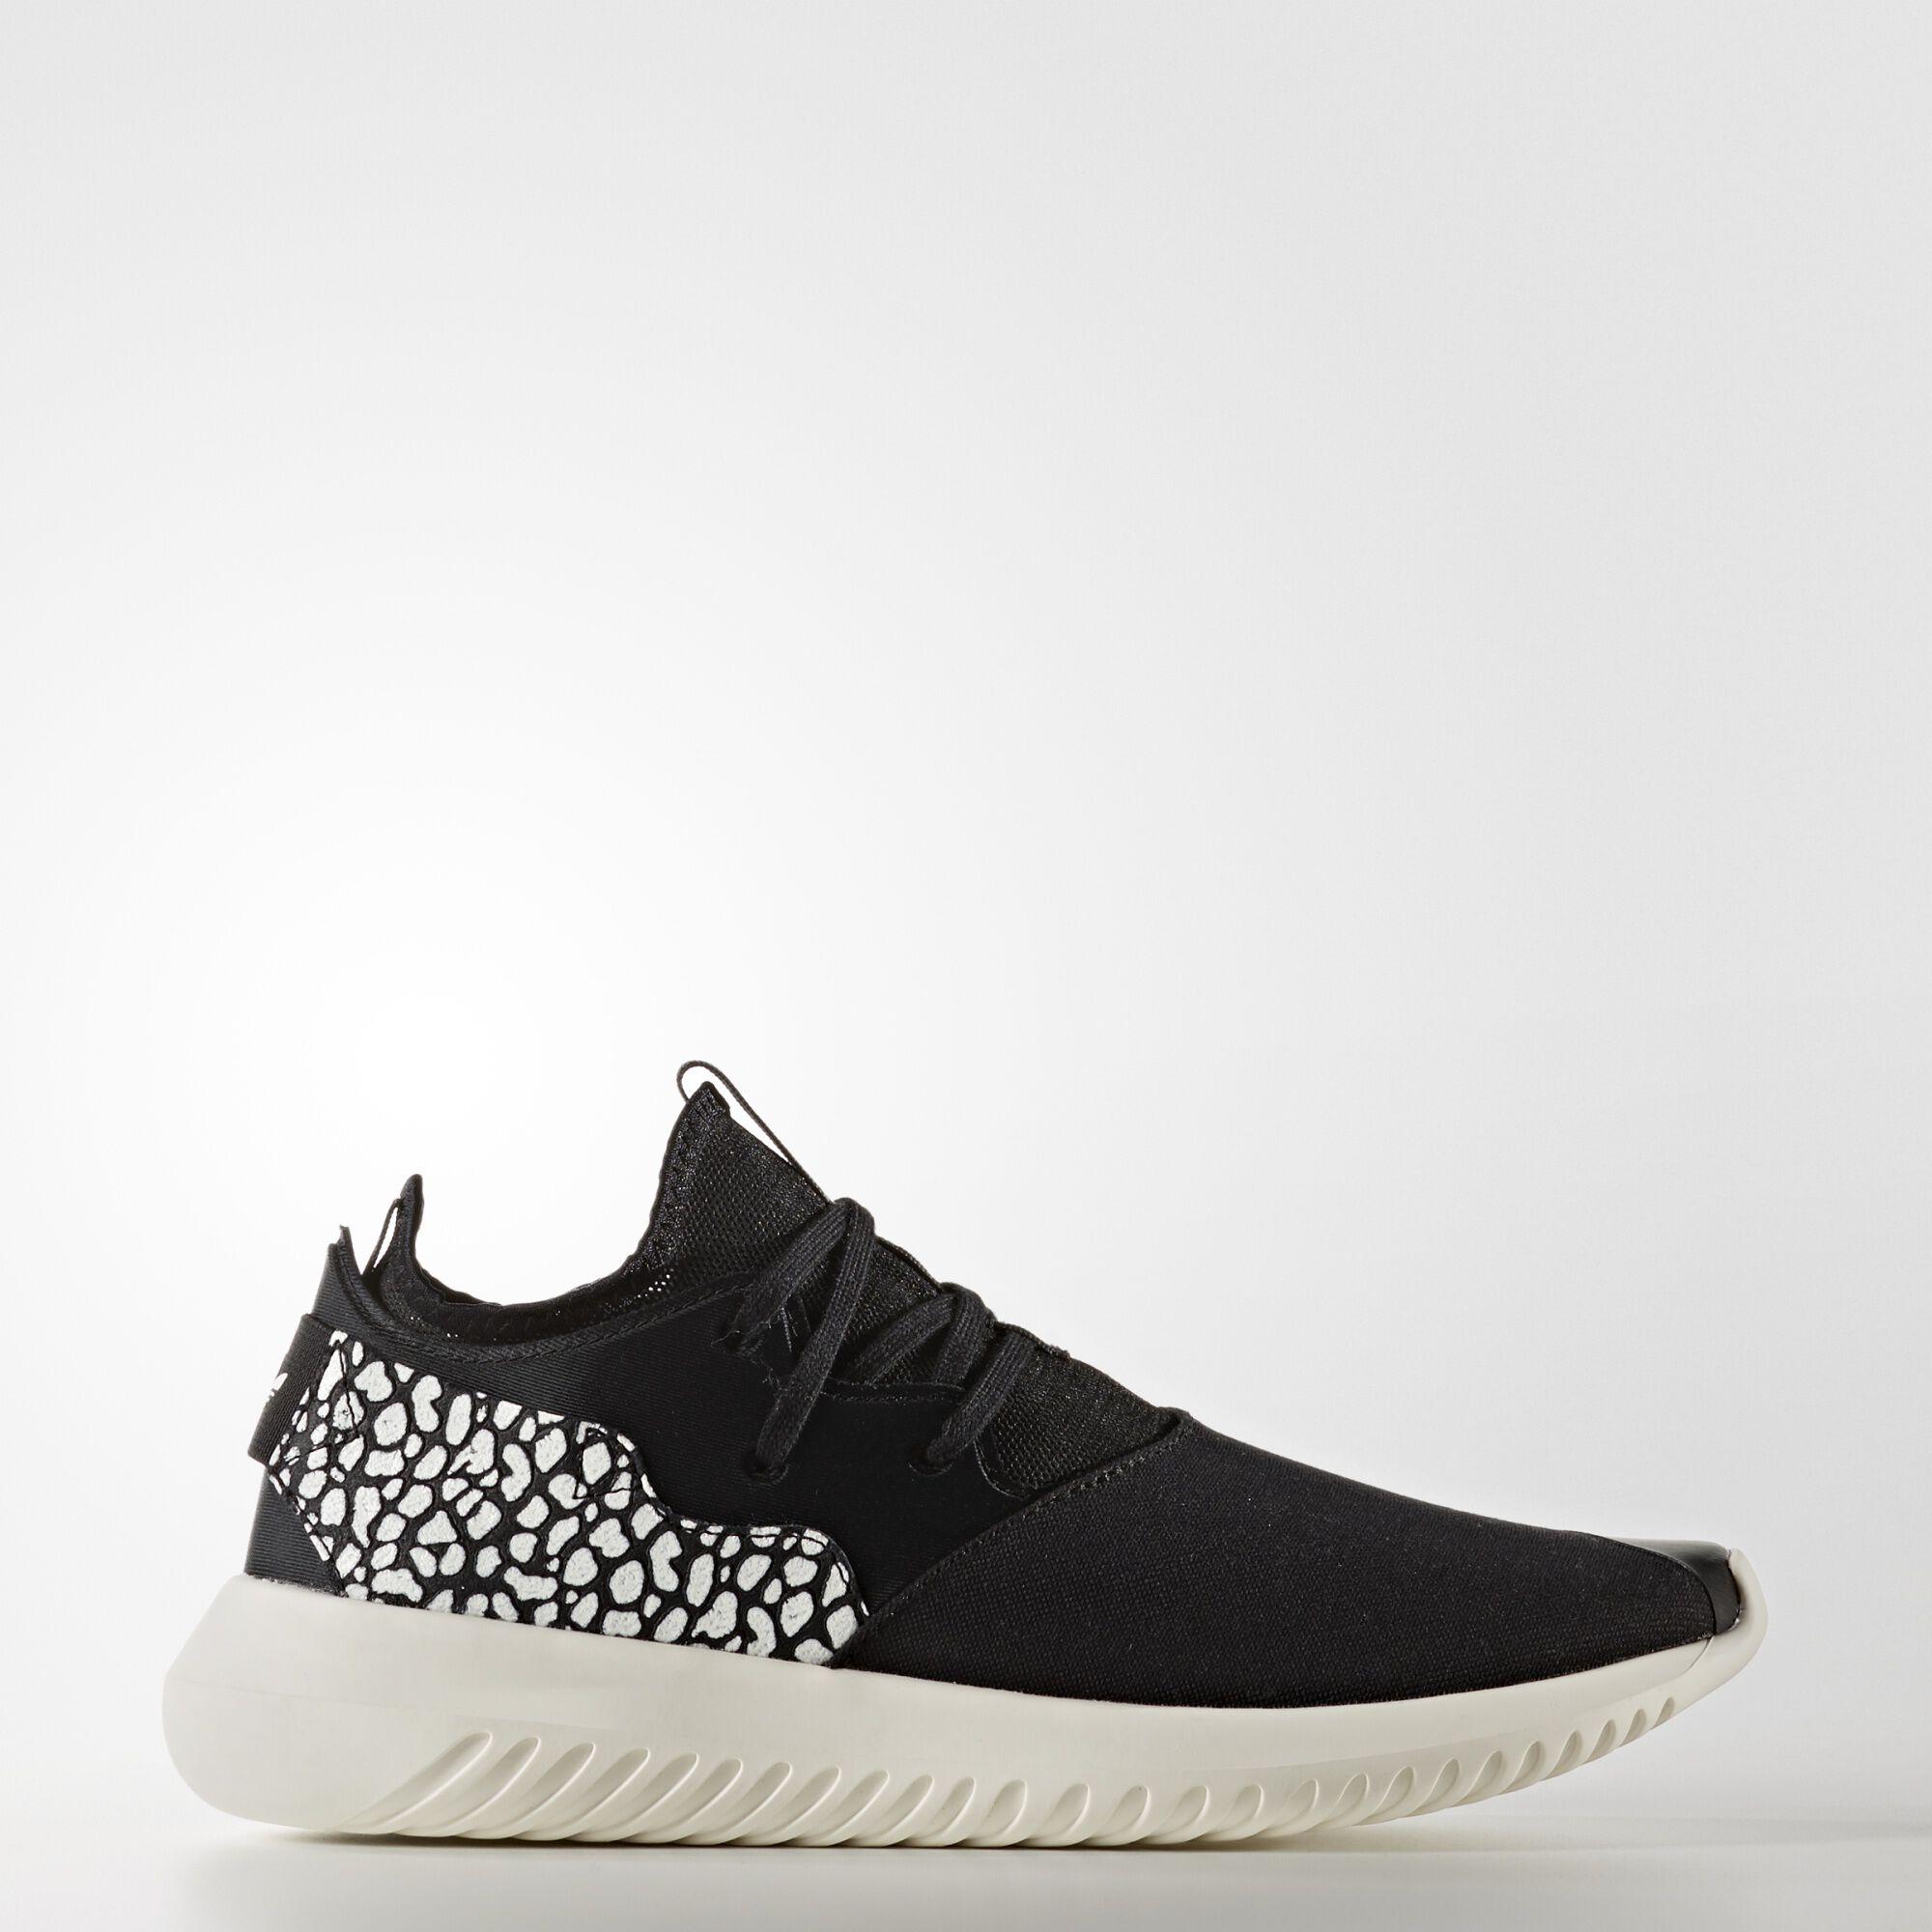 Womens Adidas Tubular Entrap Shoes Review